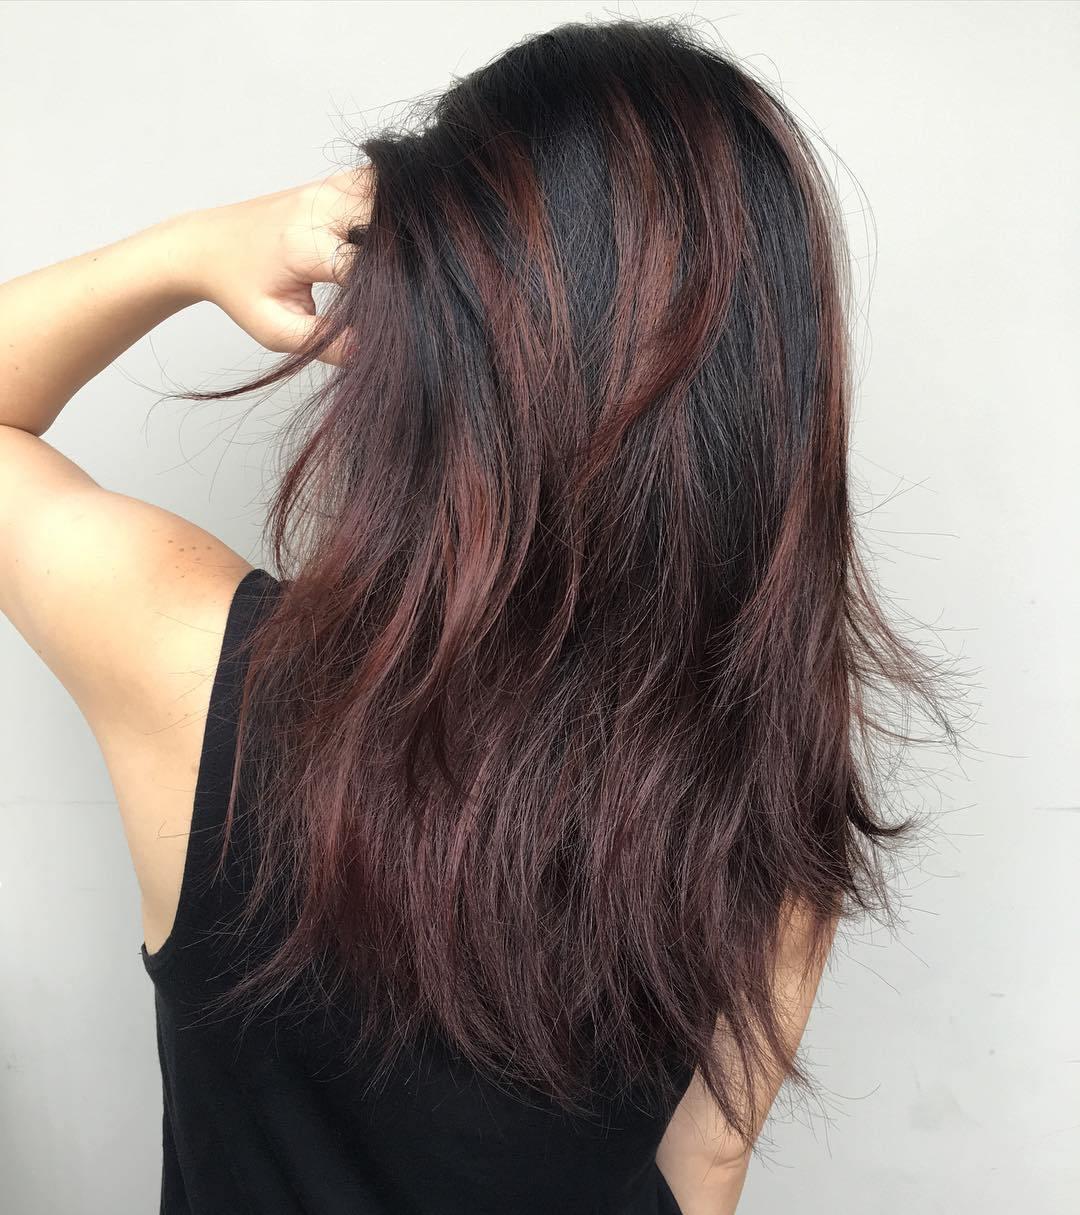 7 Natural Ways to Improve Hair Density